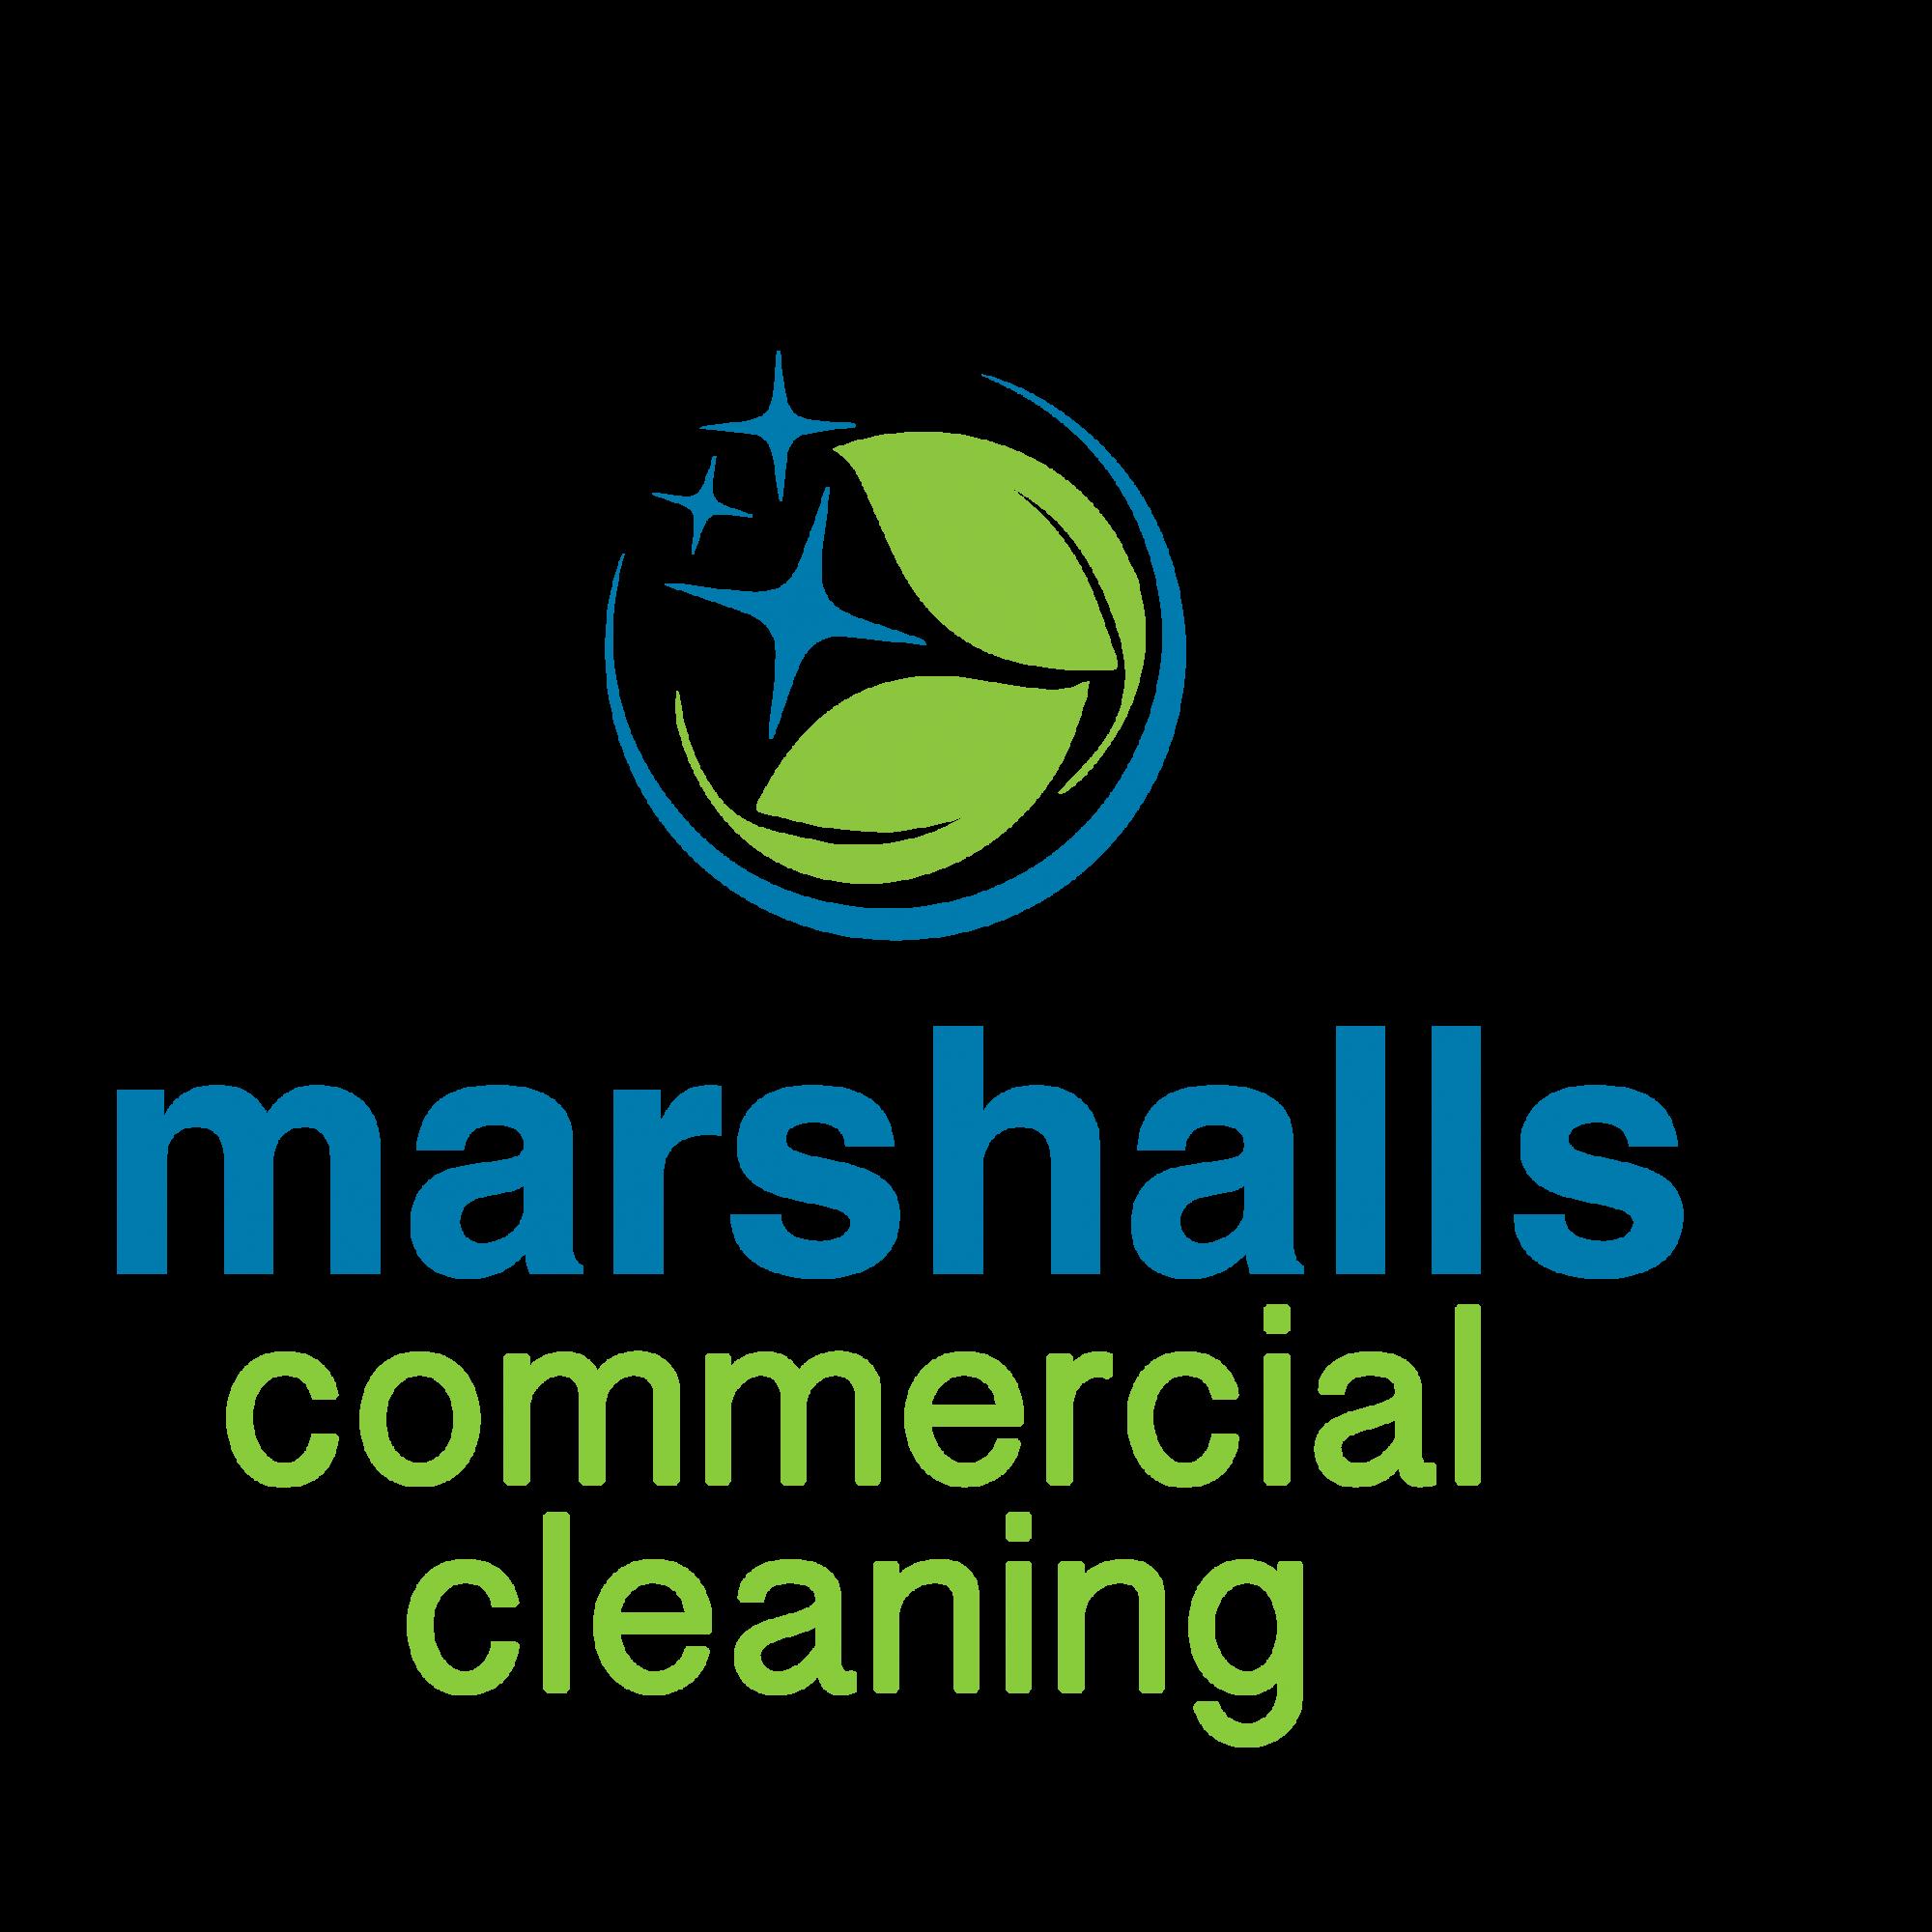 marshalls commercial cleaning full logo